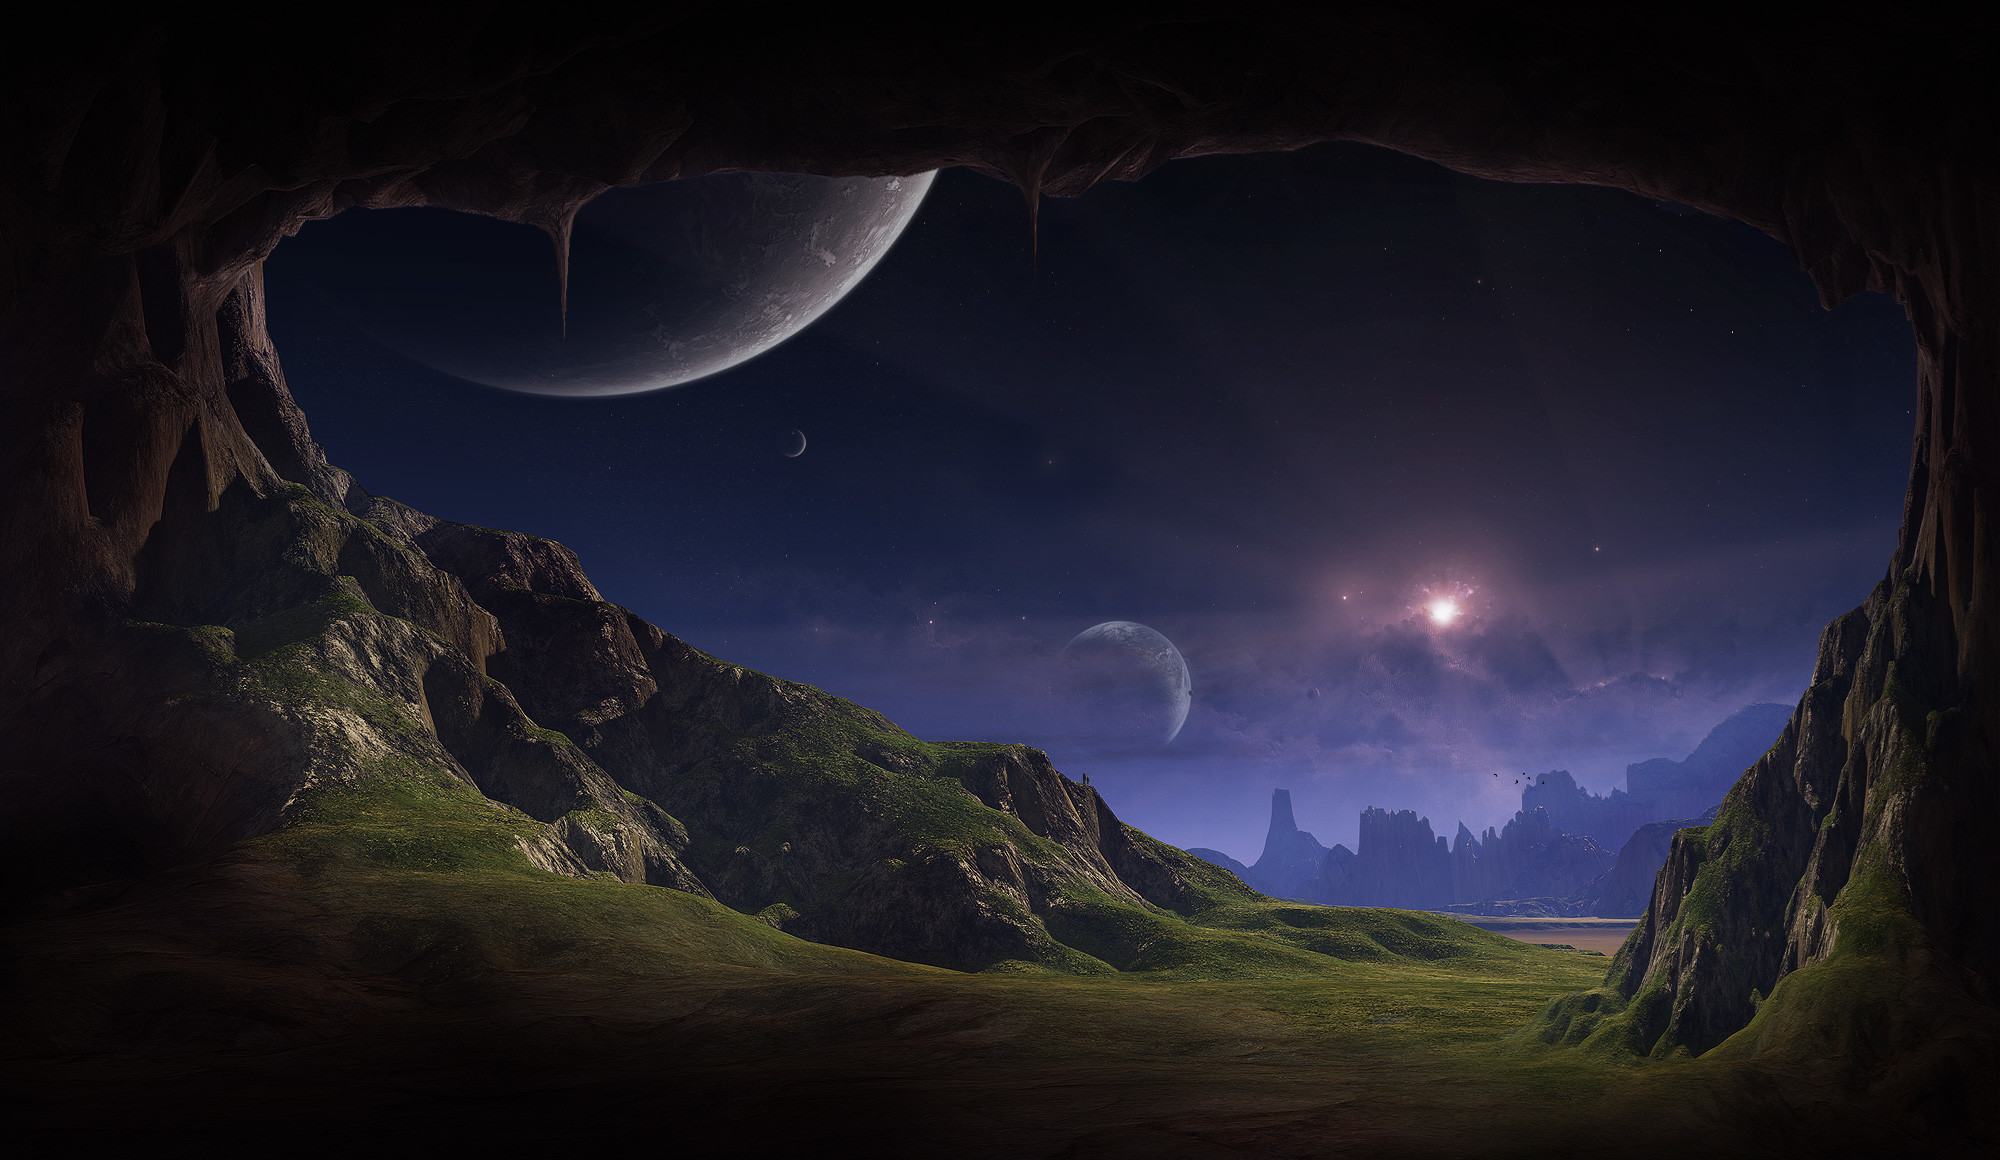 Alien Landscapes Planets | Enjoy This Wallpaper? We have tons more!